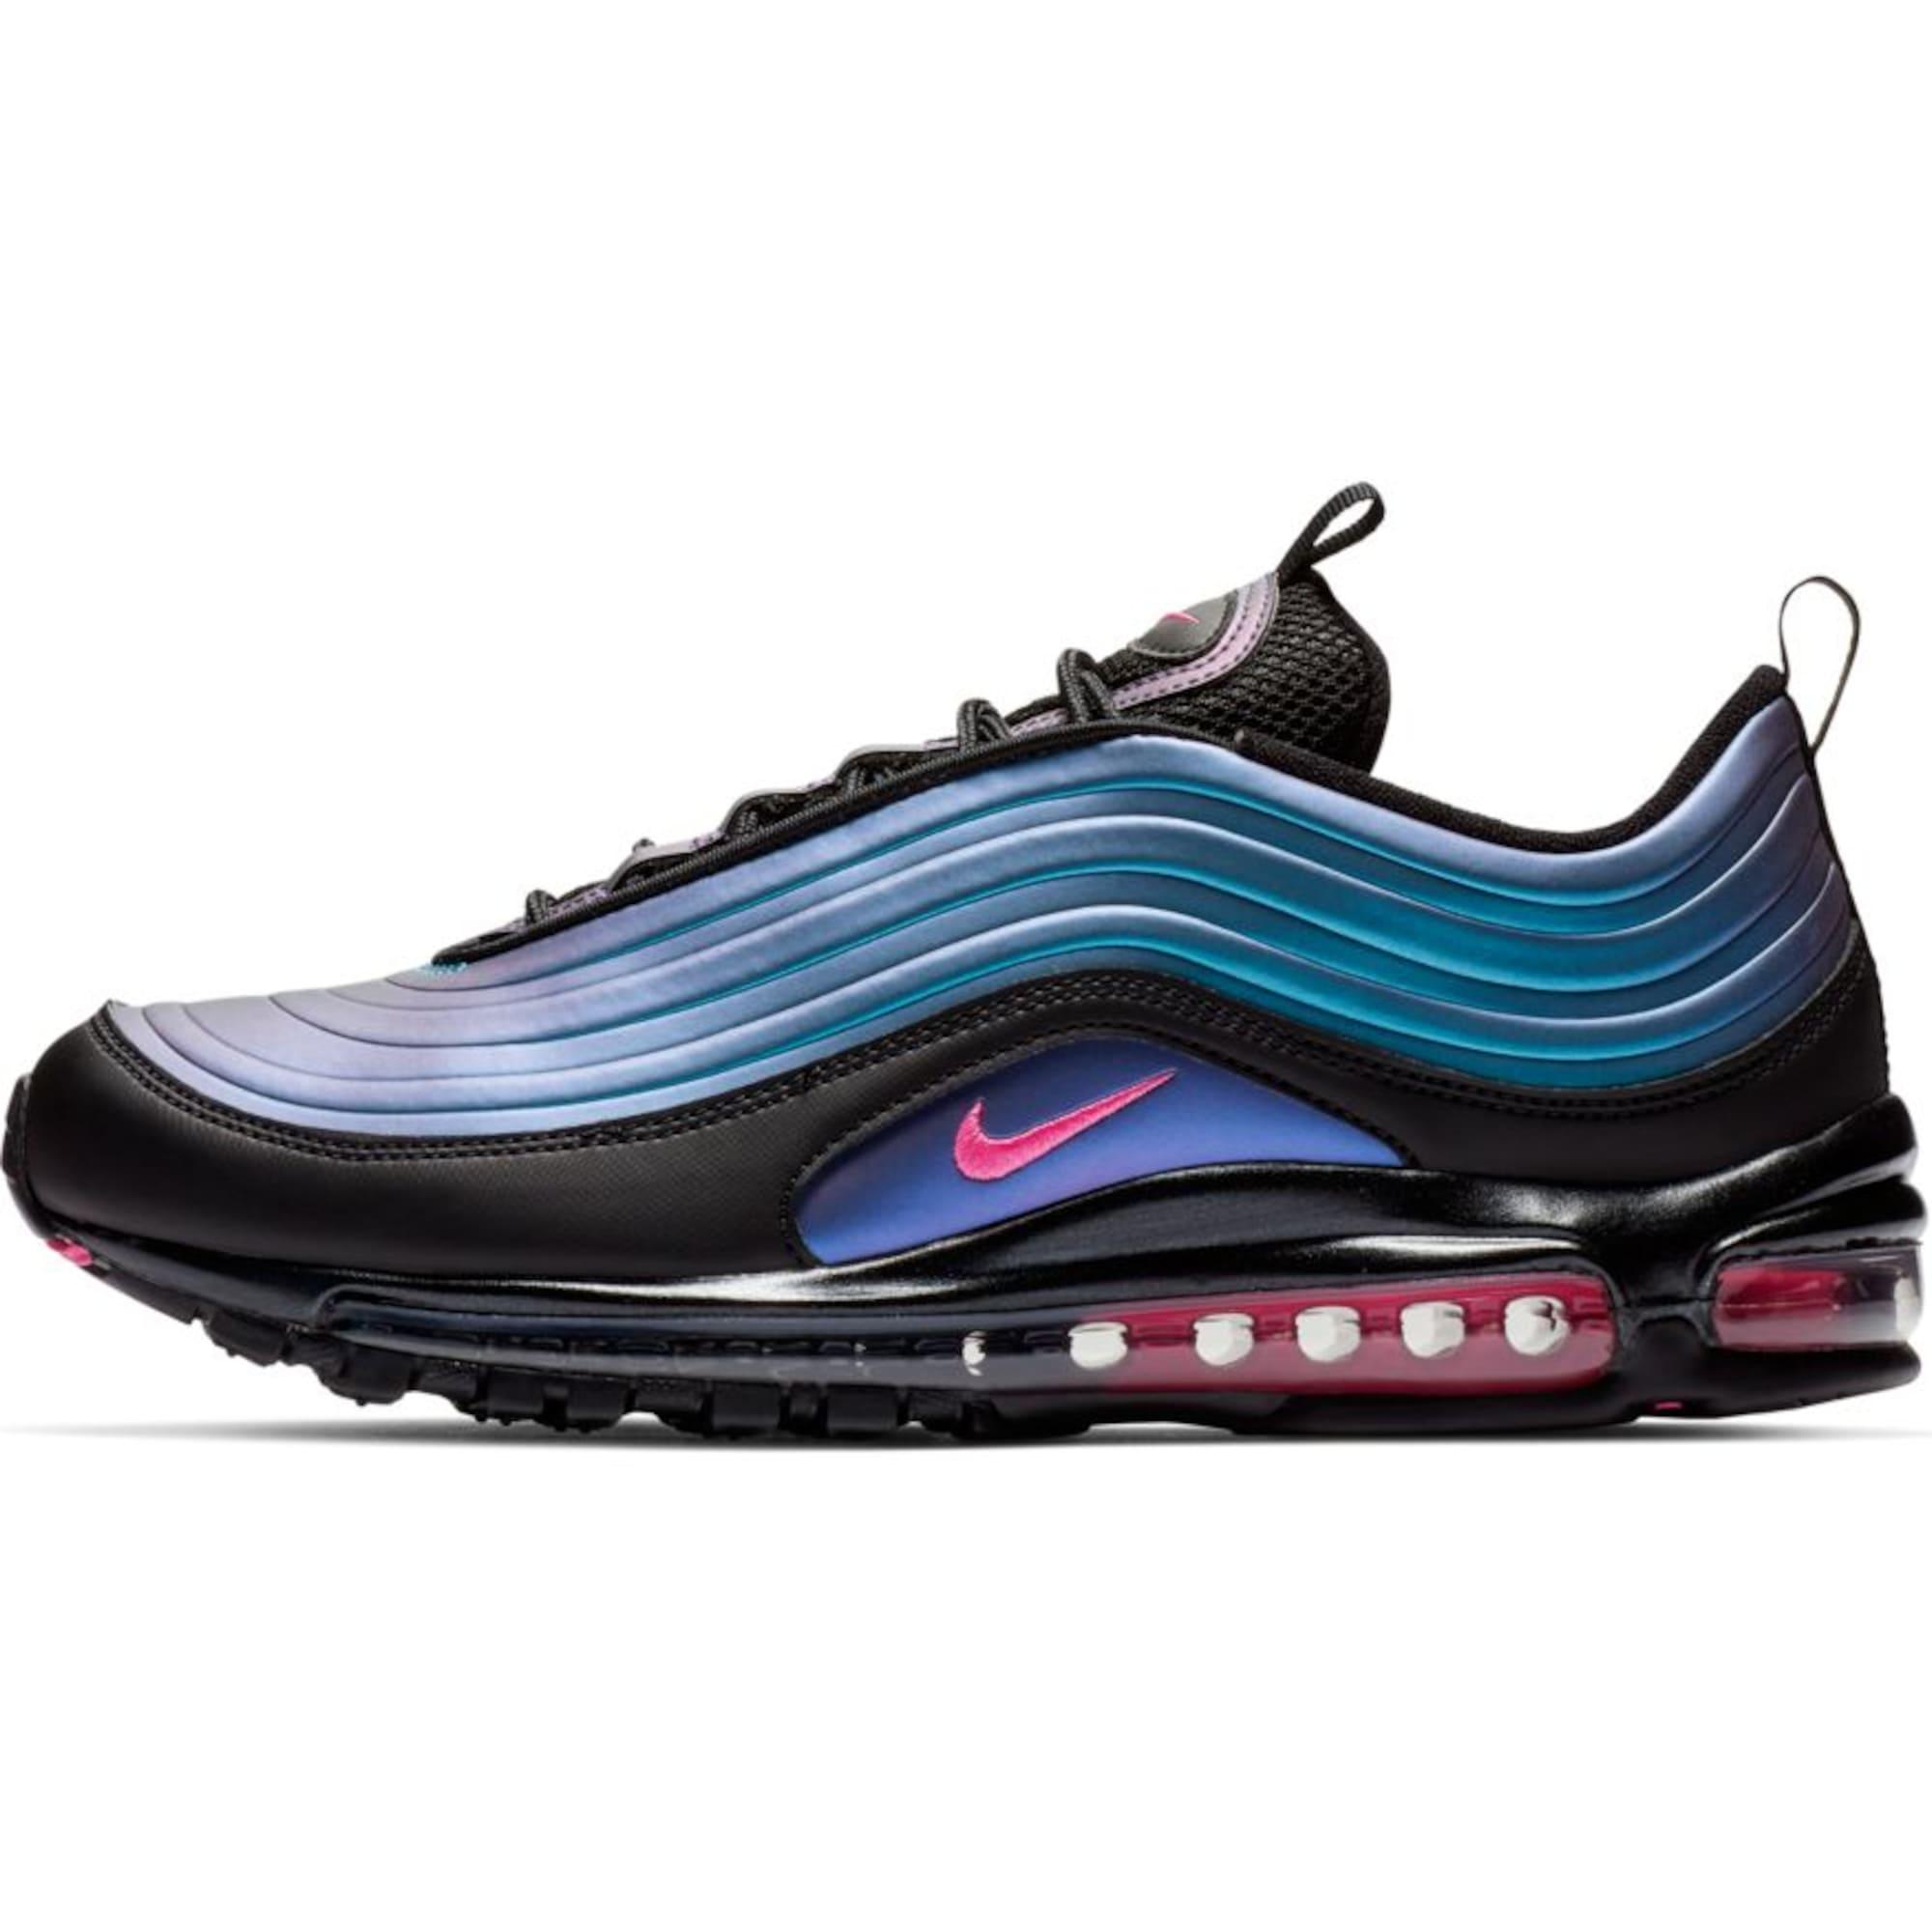 Tenisky Air Max 97 LX modrá pink černá Nike Sportswear